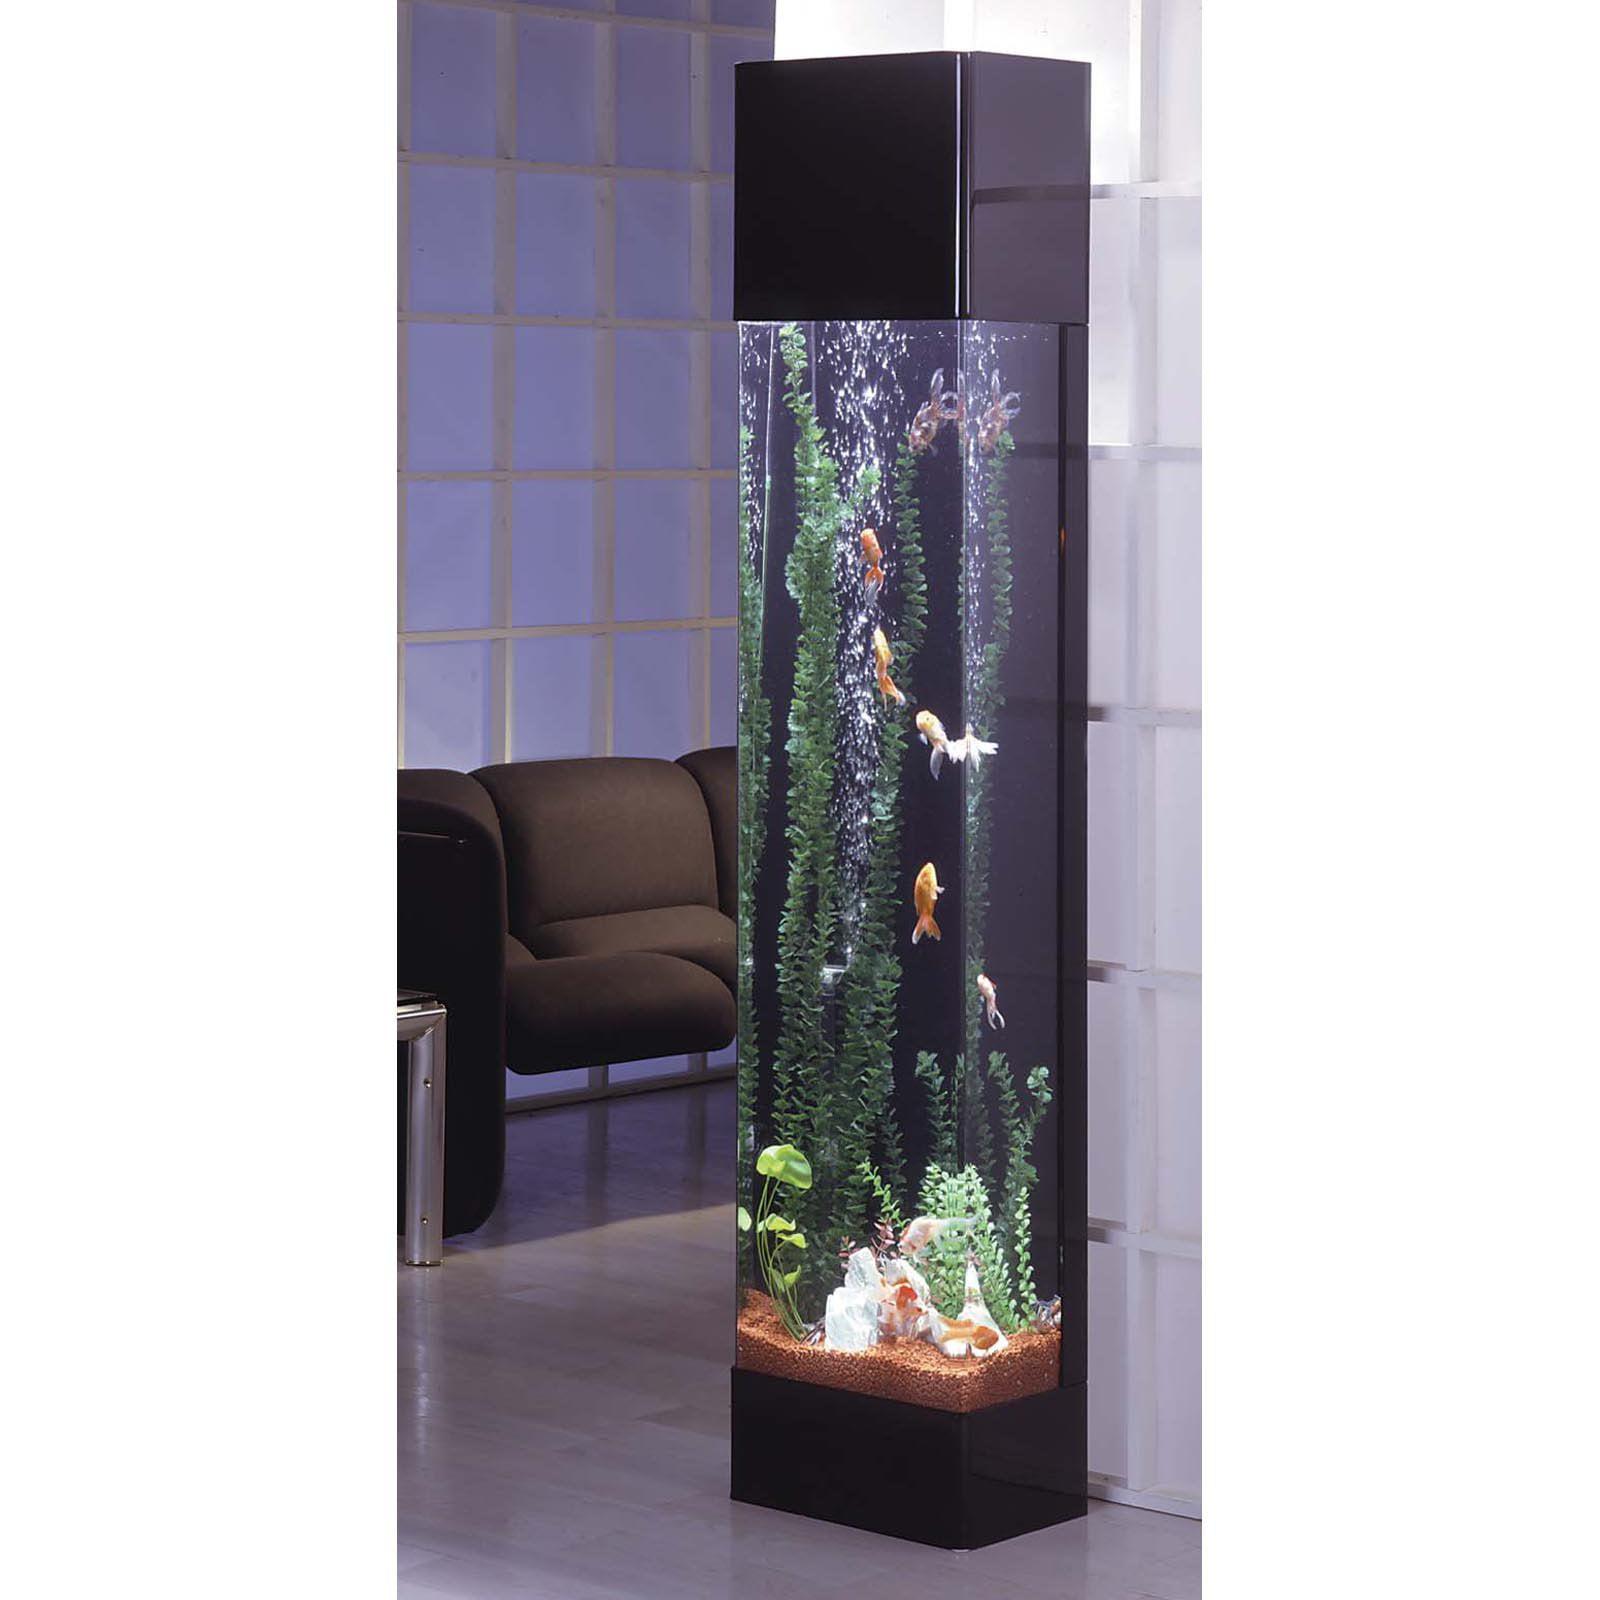 Fake fish tank aquarium walmart - Fake Fish Tank Aquarium Walmart